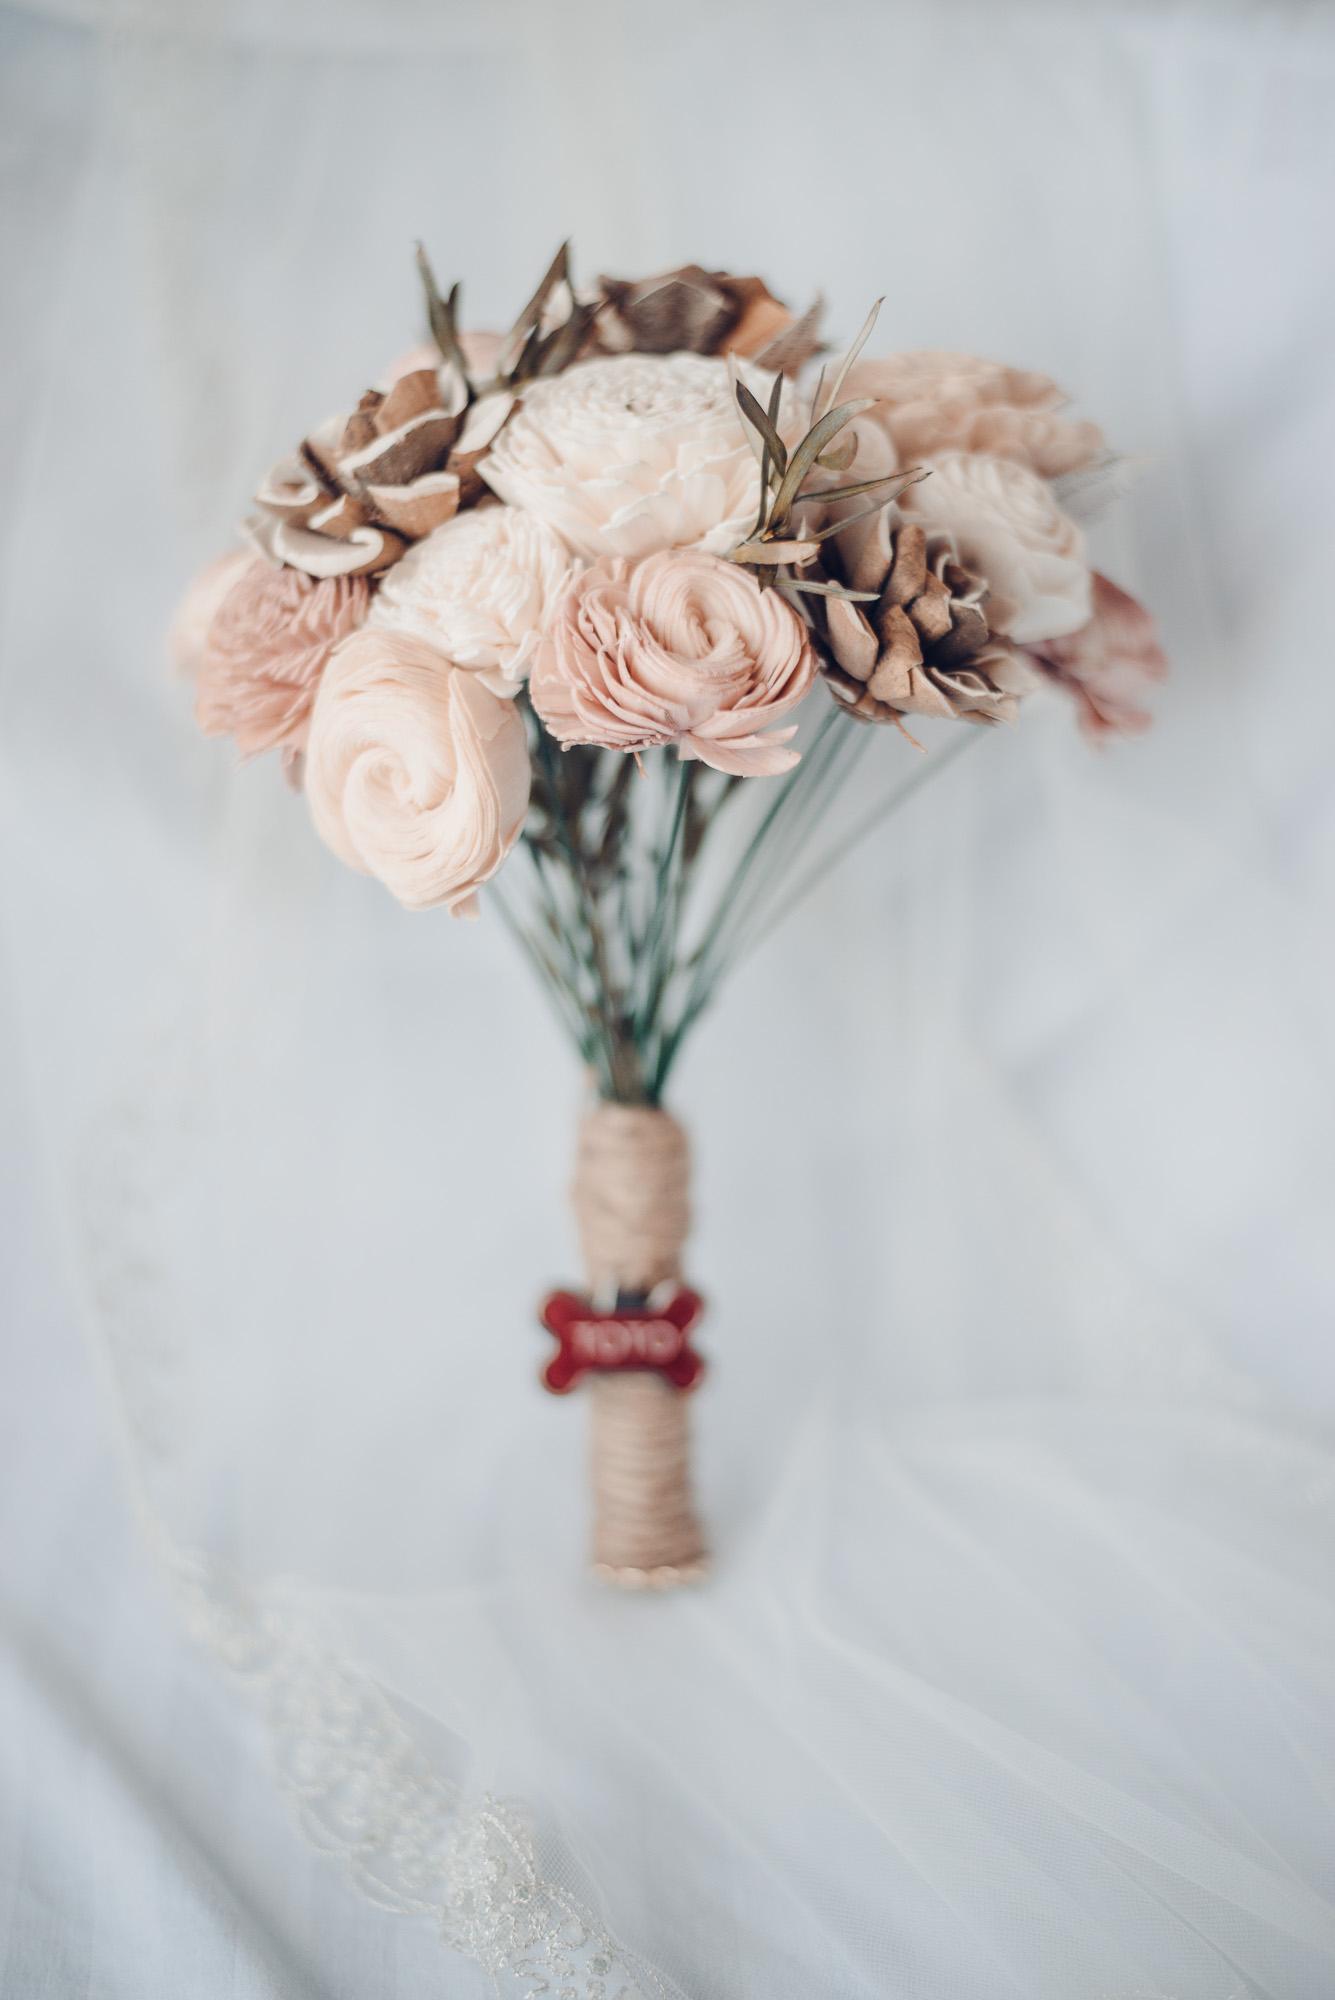 woodwinds_wedding_171020_web-8.jpg